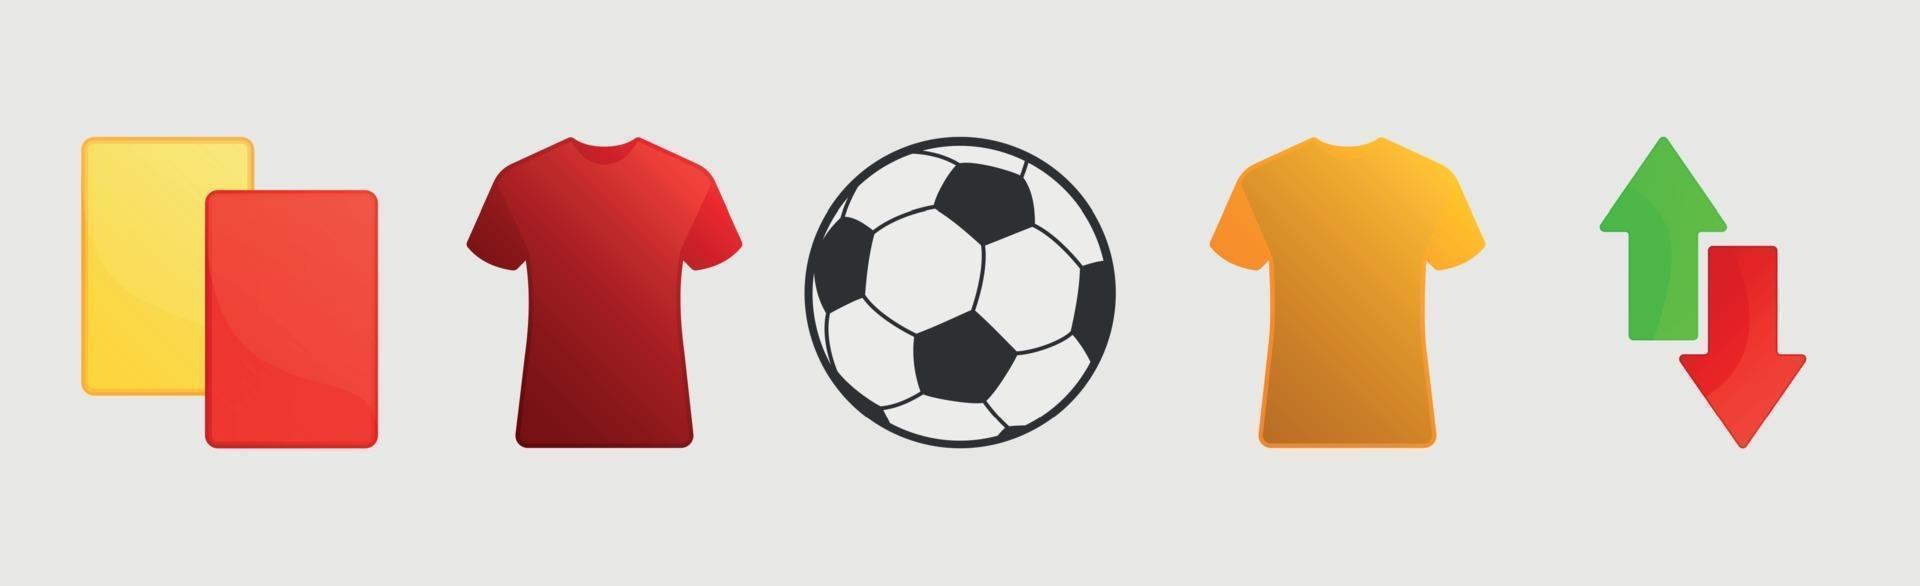 fotbollsutrustning på en vit bakgrund - vektor